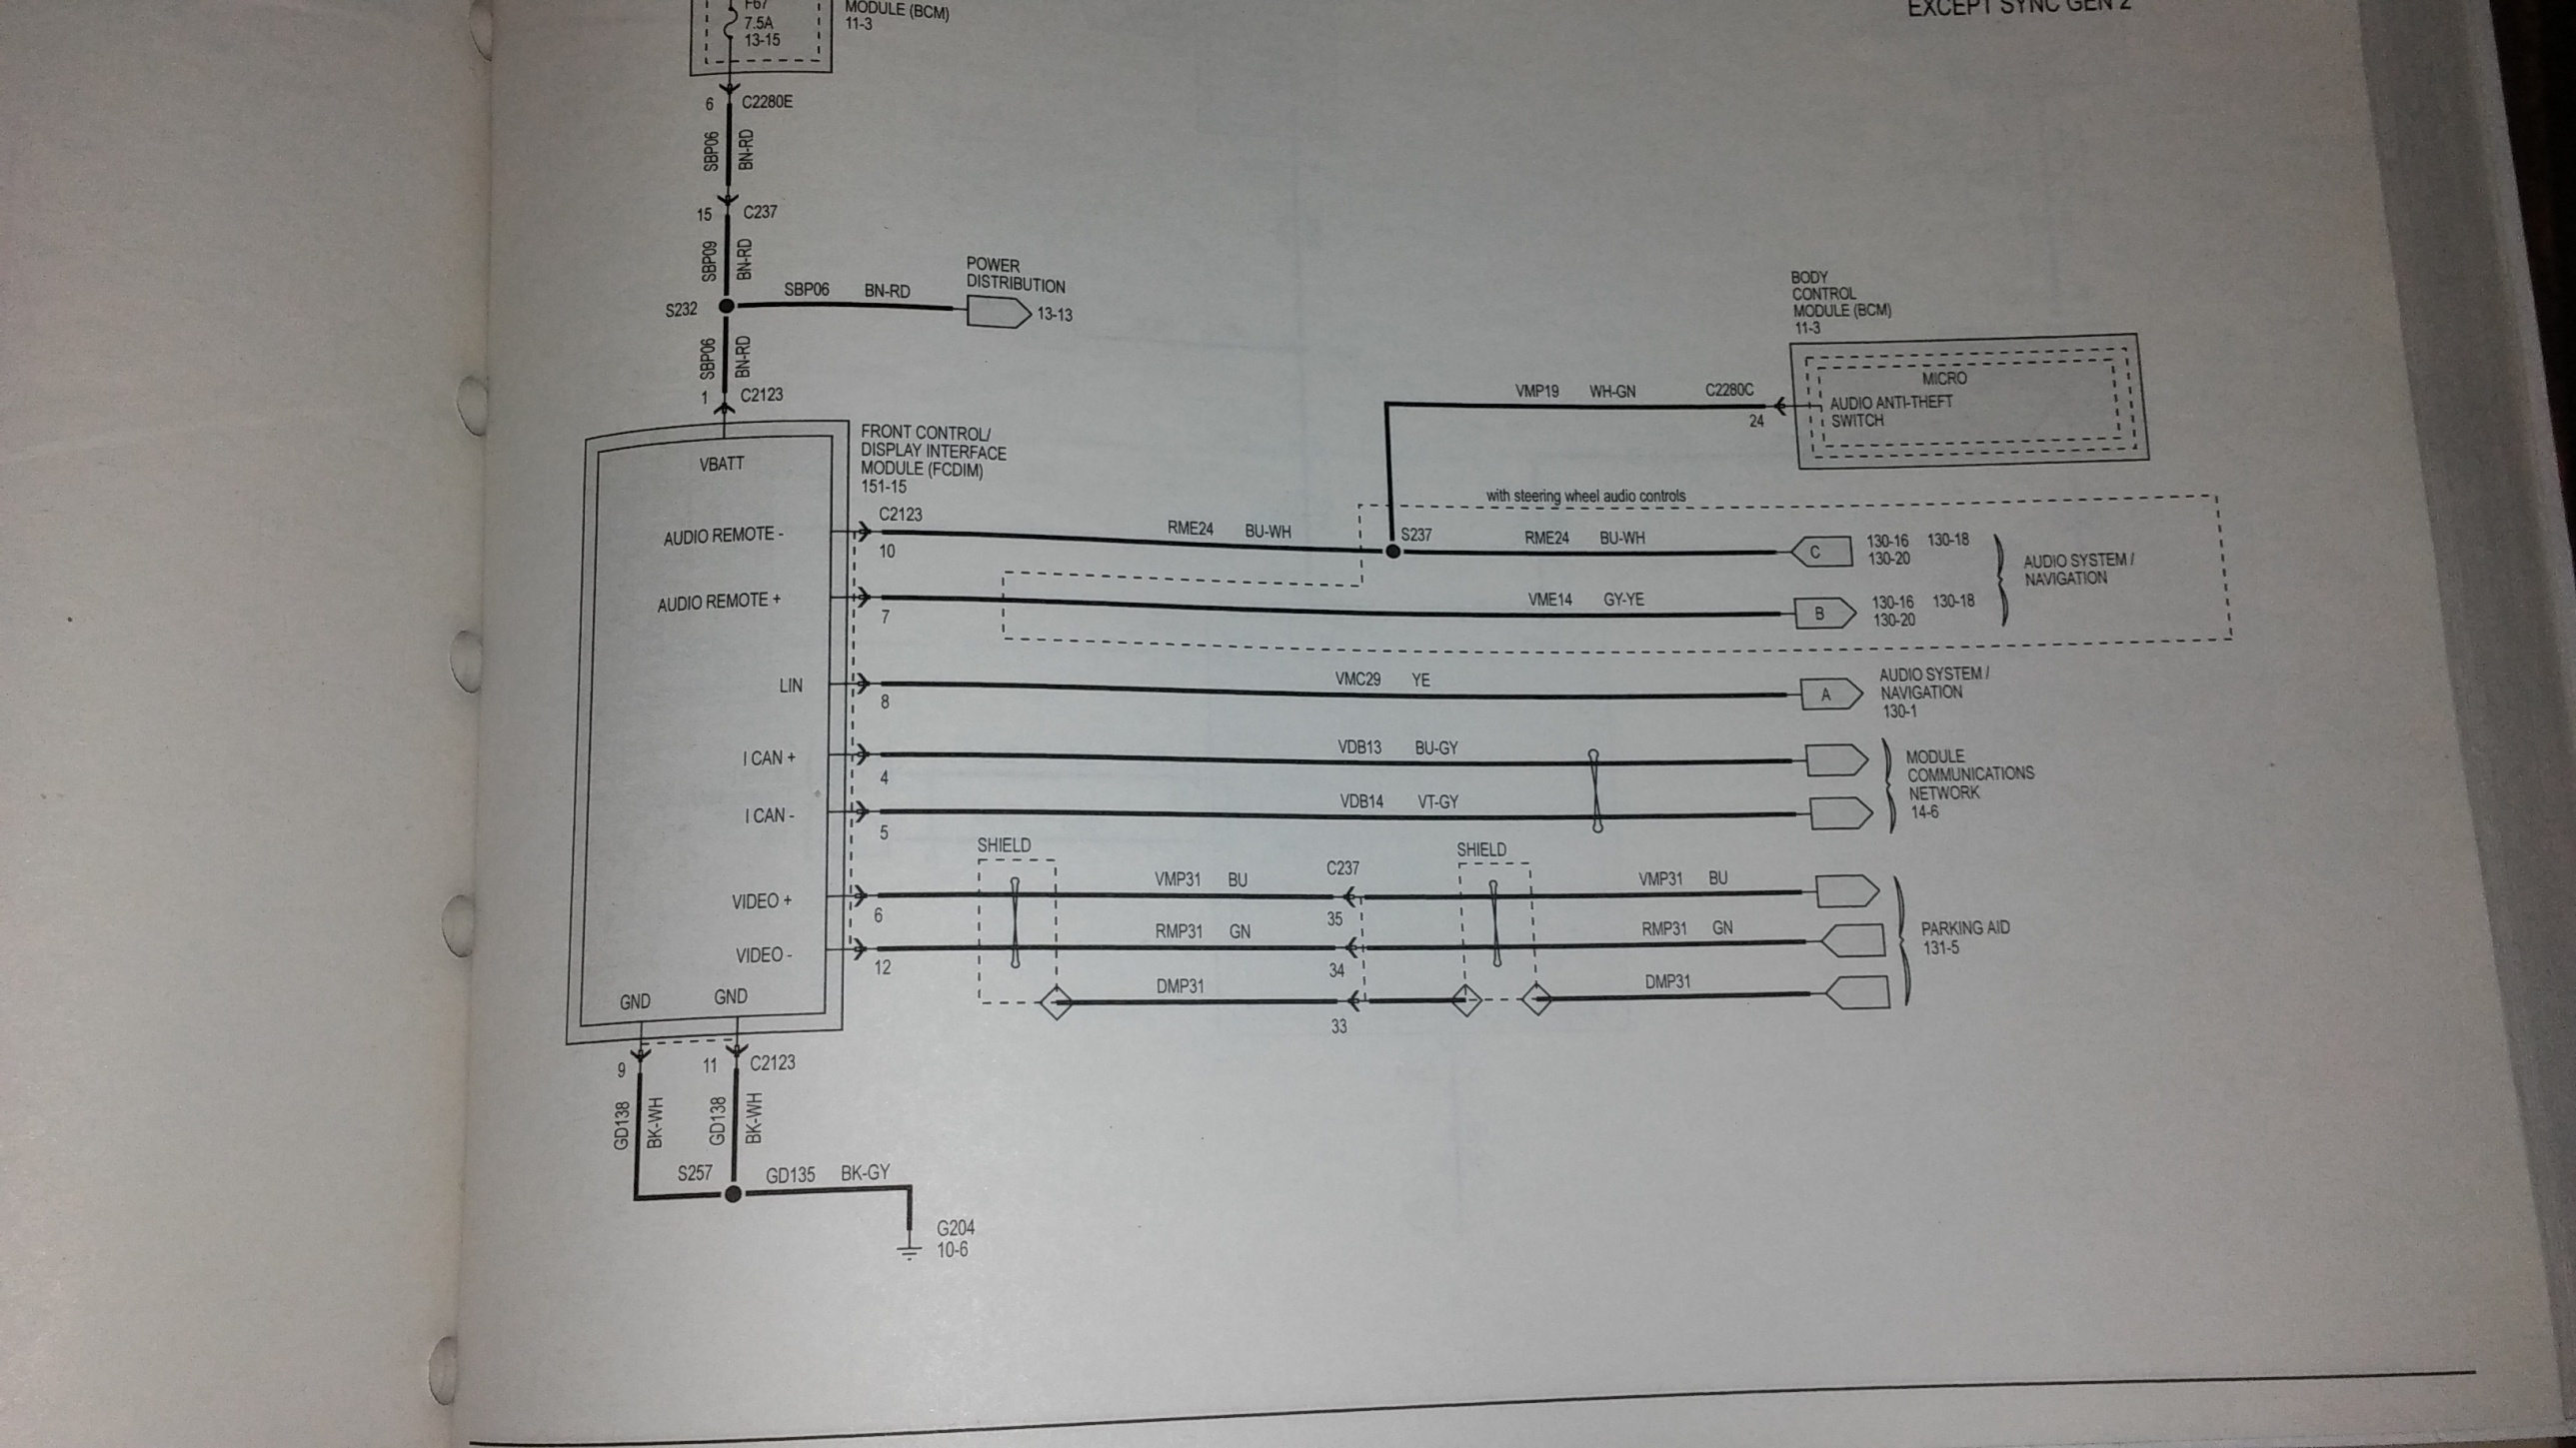 f250 rear view camera wiring diagram oem backup camera install on aftermarket head unit focus  oem backup camera install on